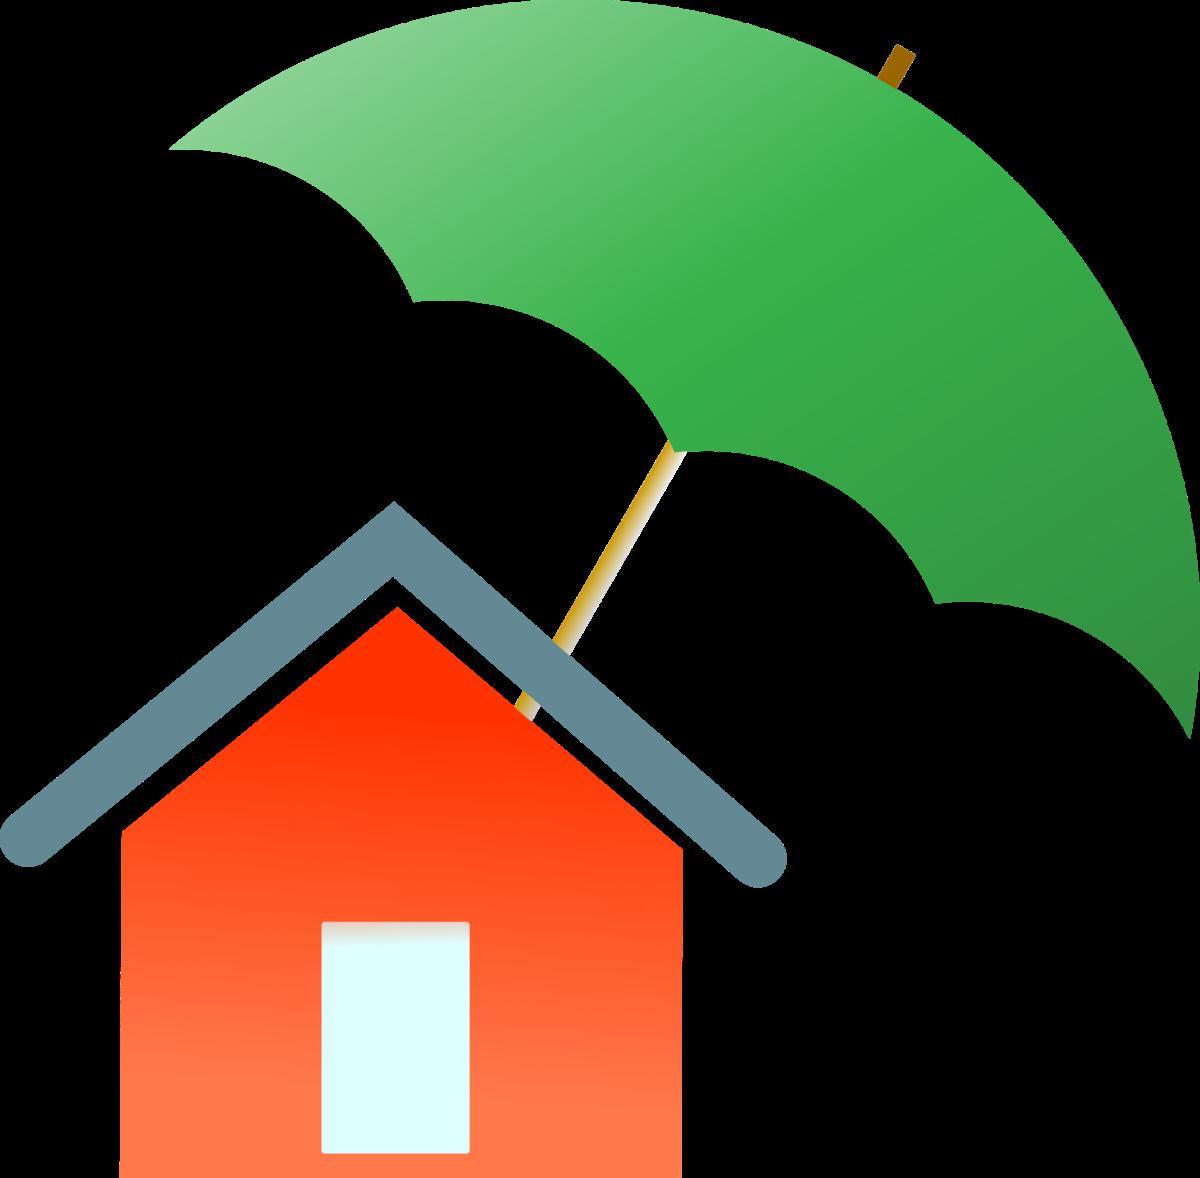 Tenant clipart graphic transparent download Renters insurance can prevent surprise bills | The Daily ... graphic transparent download